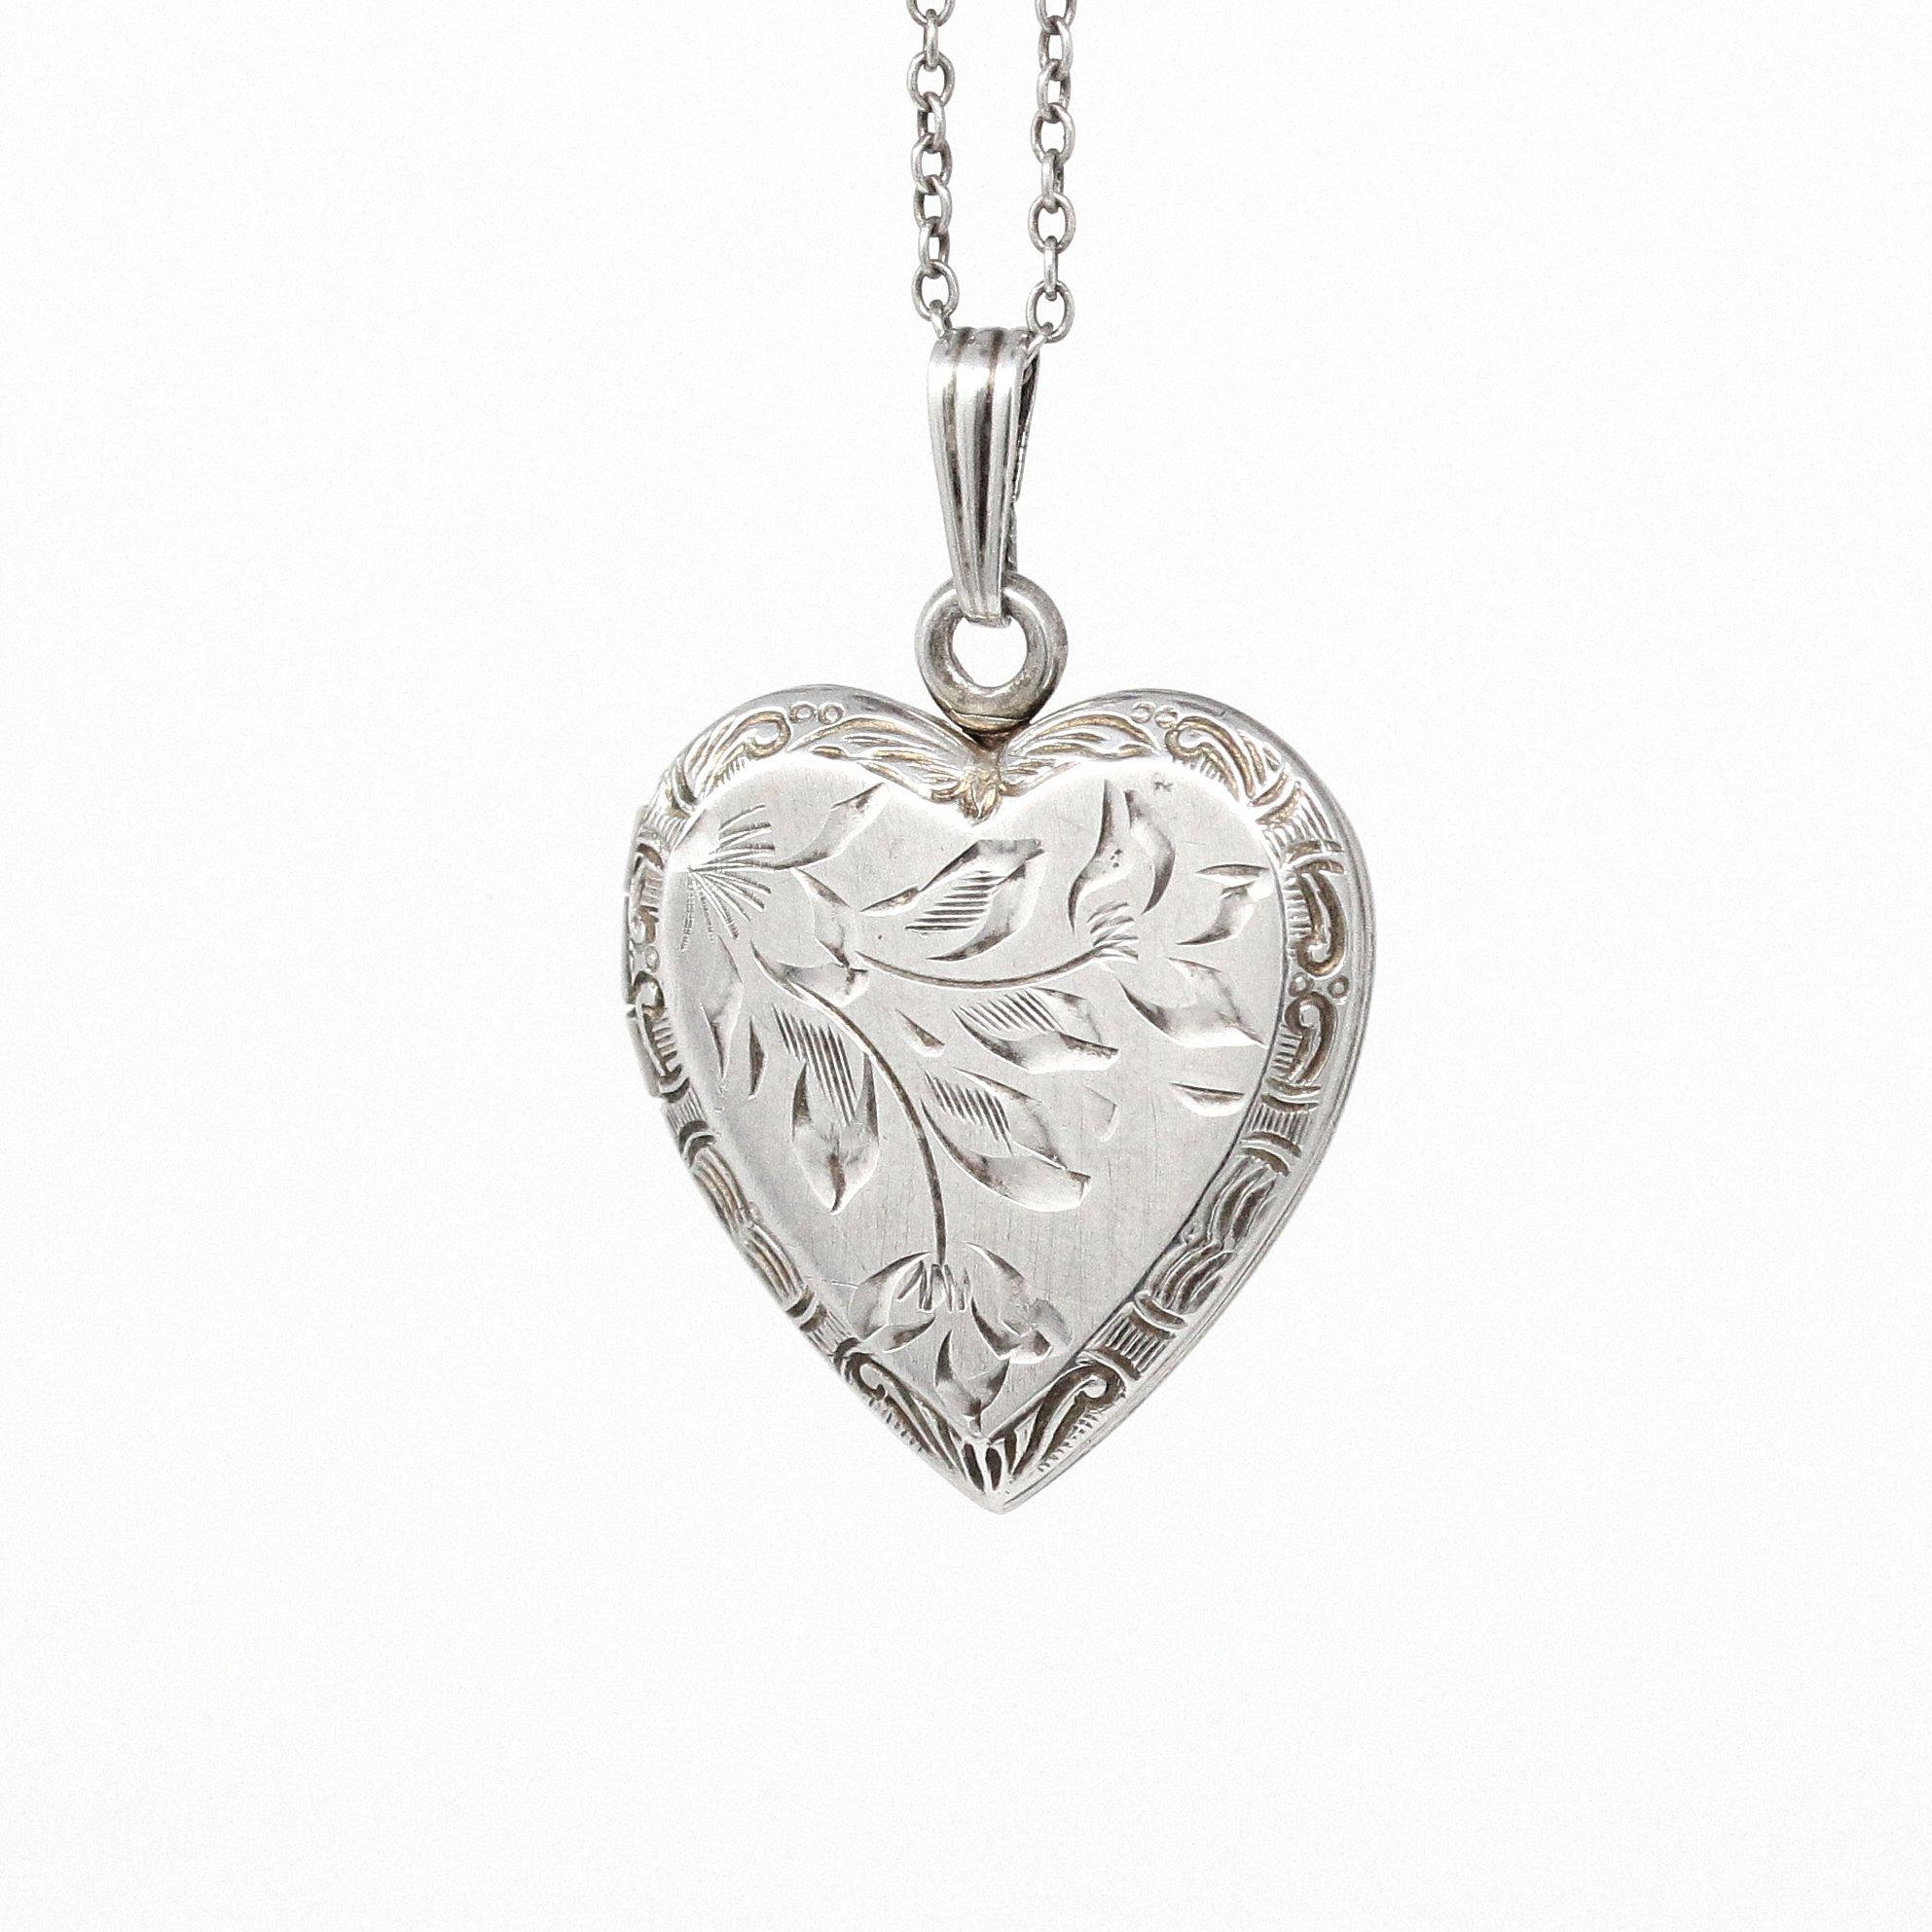 Vintage silver heart pendant necklace